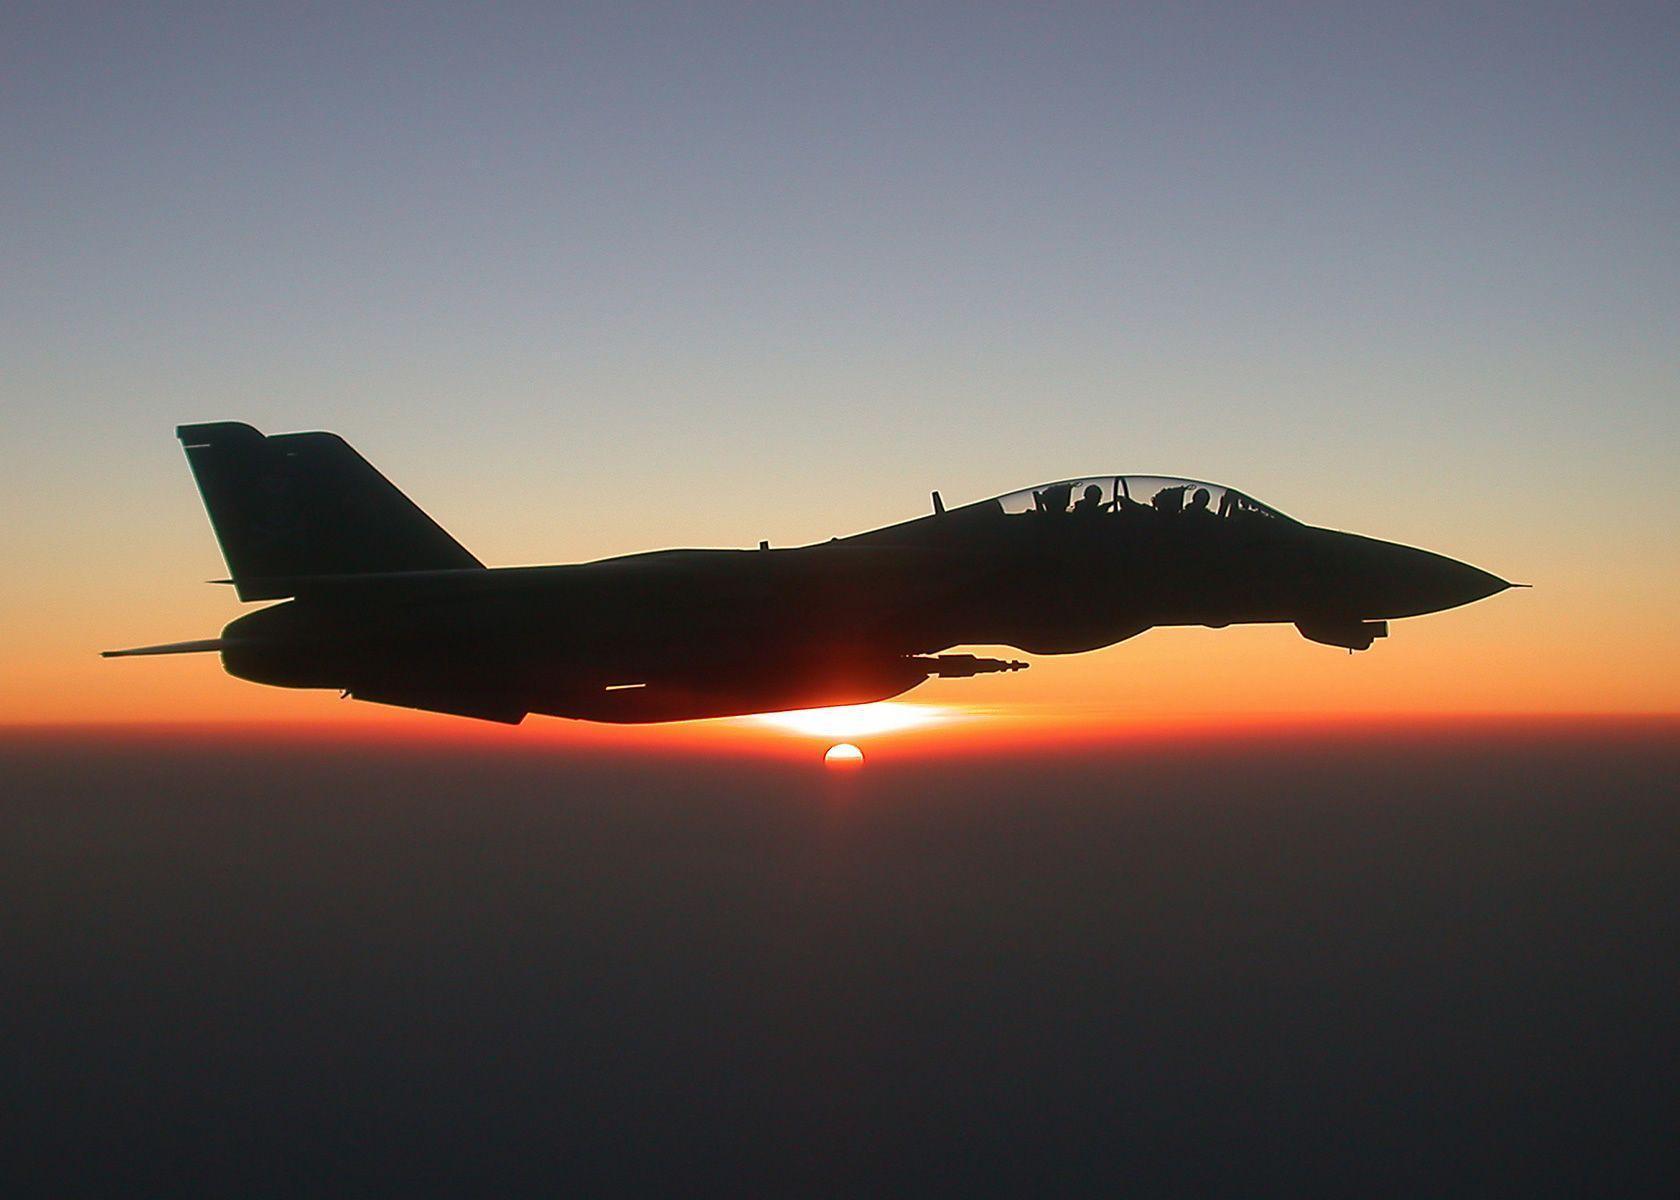 Top Gun F-14 Photography Inspiration | Abduzeedo Design Inspiration